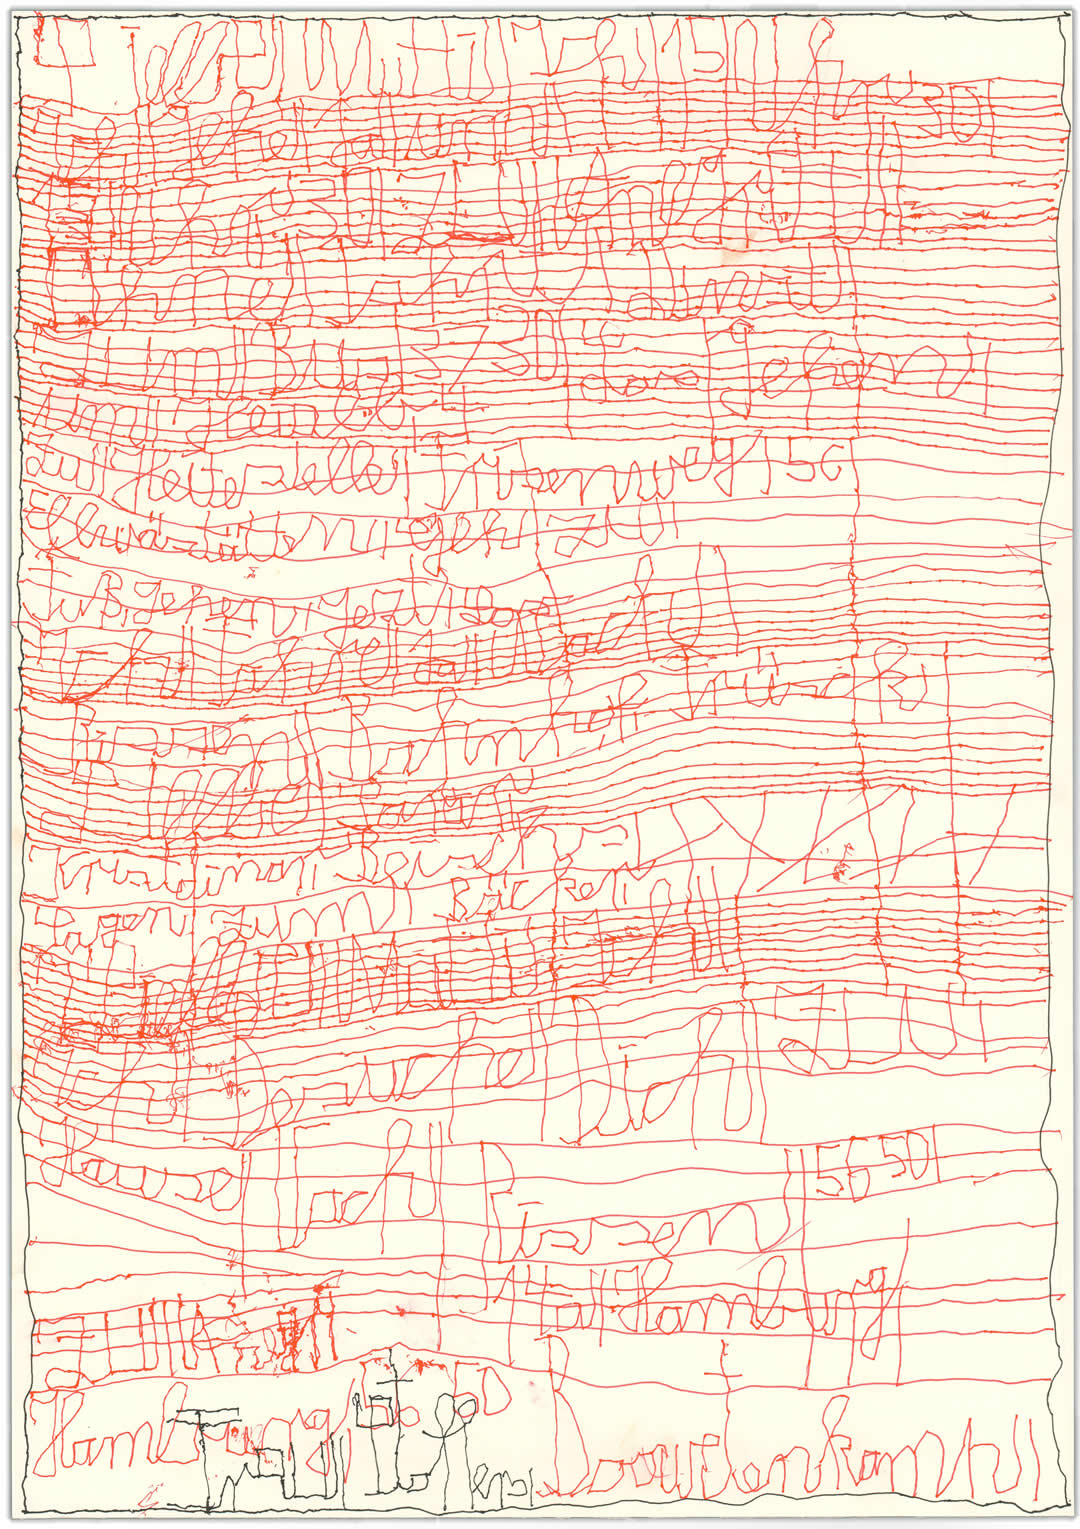 Harald Stoffers | Brief429 2019 | 42x29,6cm | viennacontemporary | Galerie3